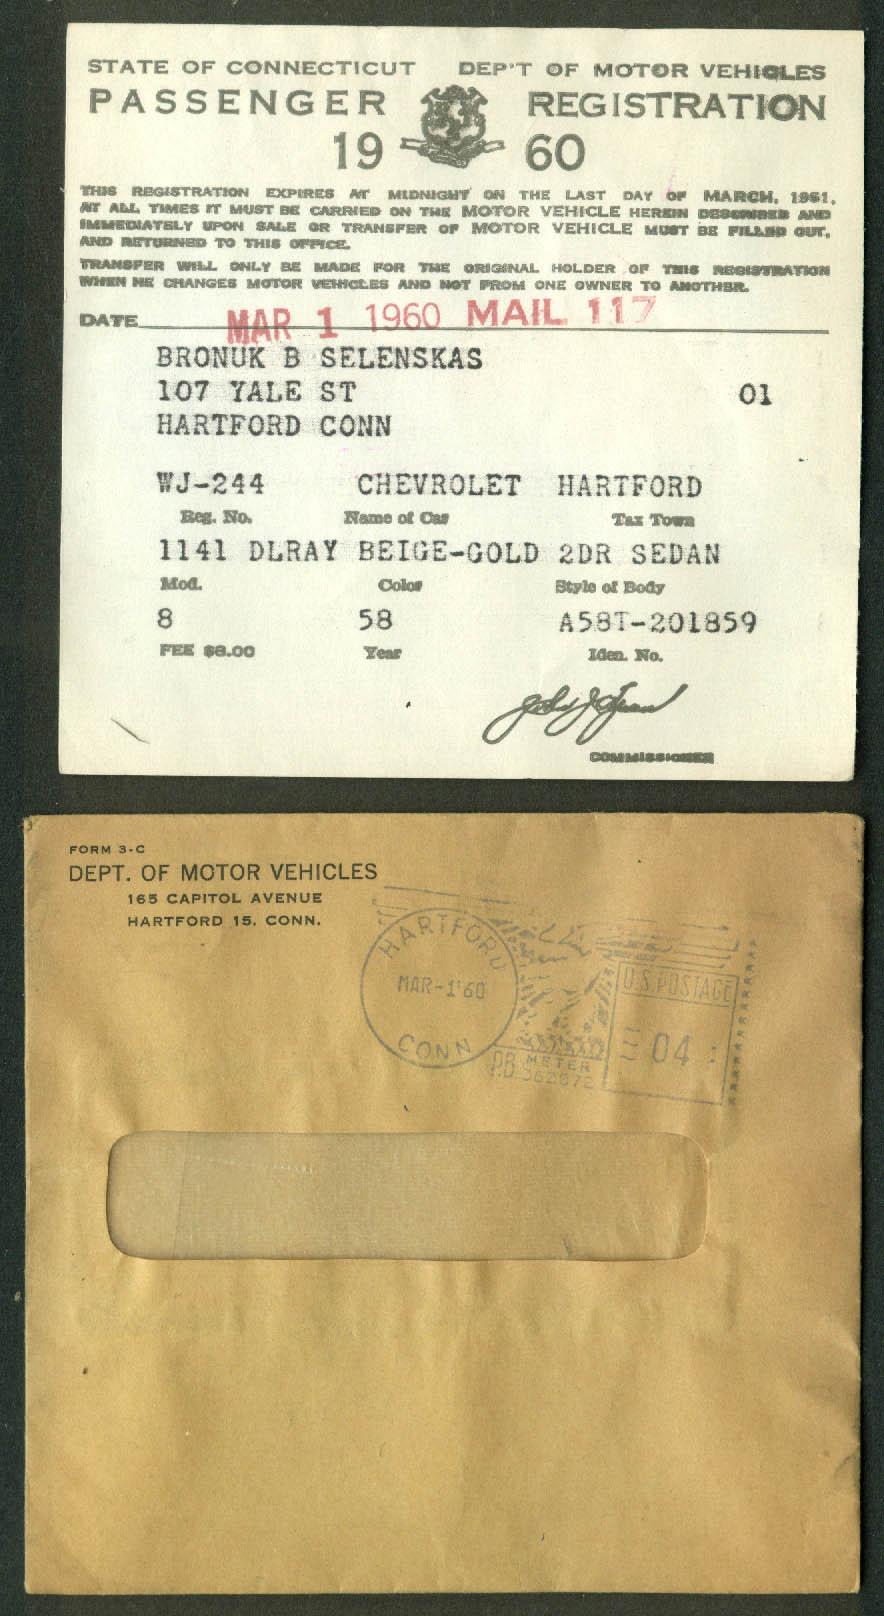 1958 Chevrolet Delray 2-door sedan Connecticut Registration 1960